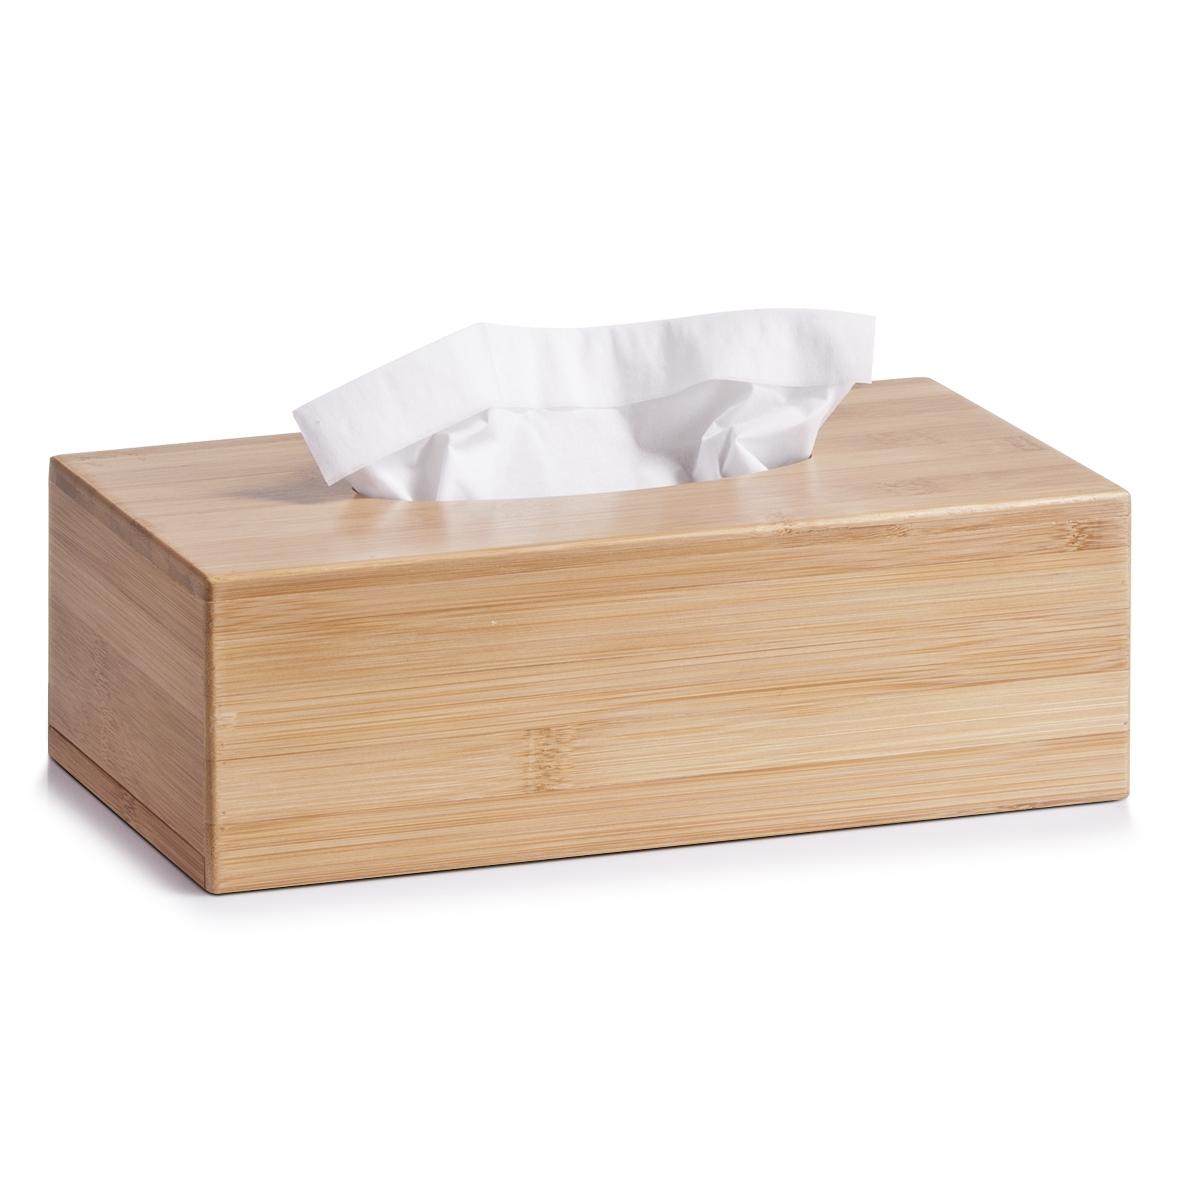 Cutie pentru servetele, Kosmetik-2 Natural Bamboo, l27,5xA15,5xH8,5 cm